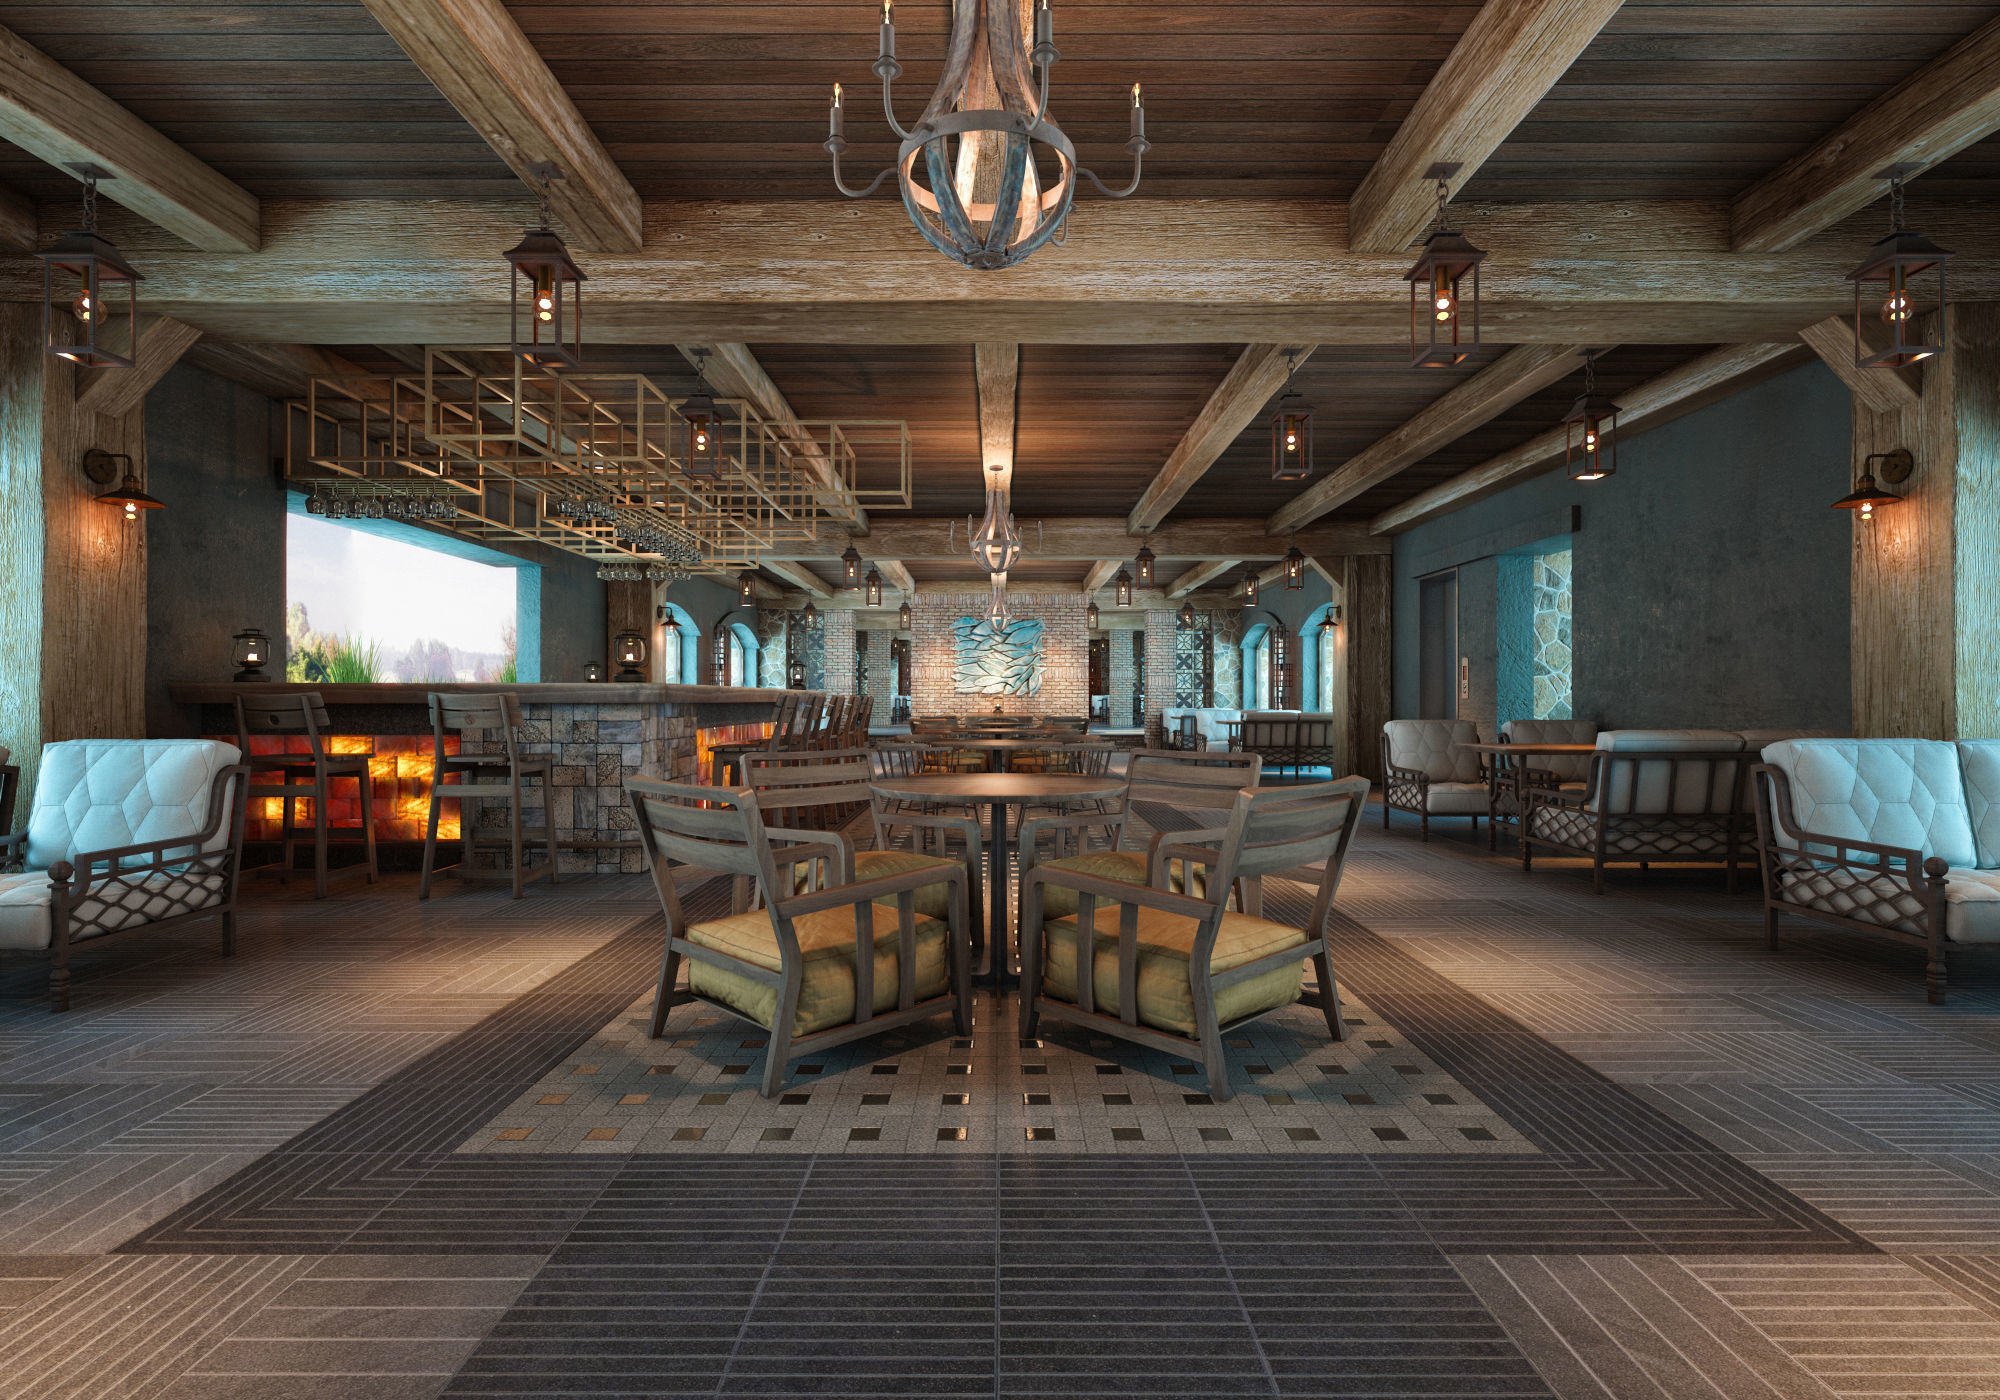 AQ Rustic Restaurant